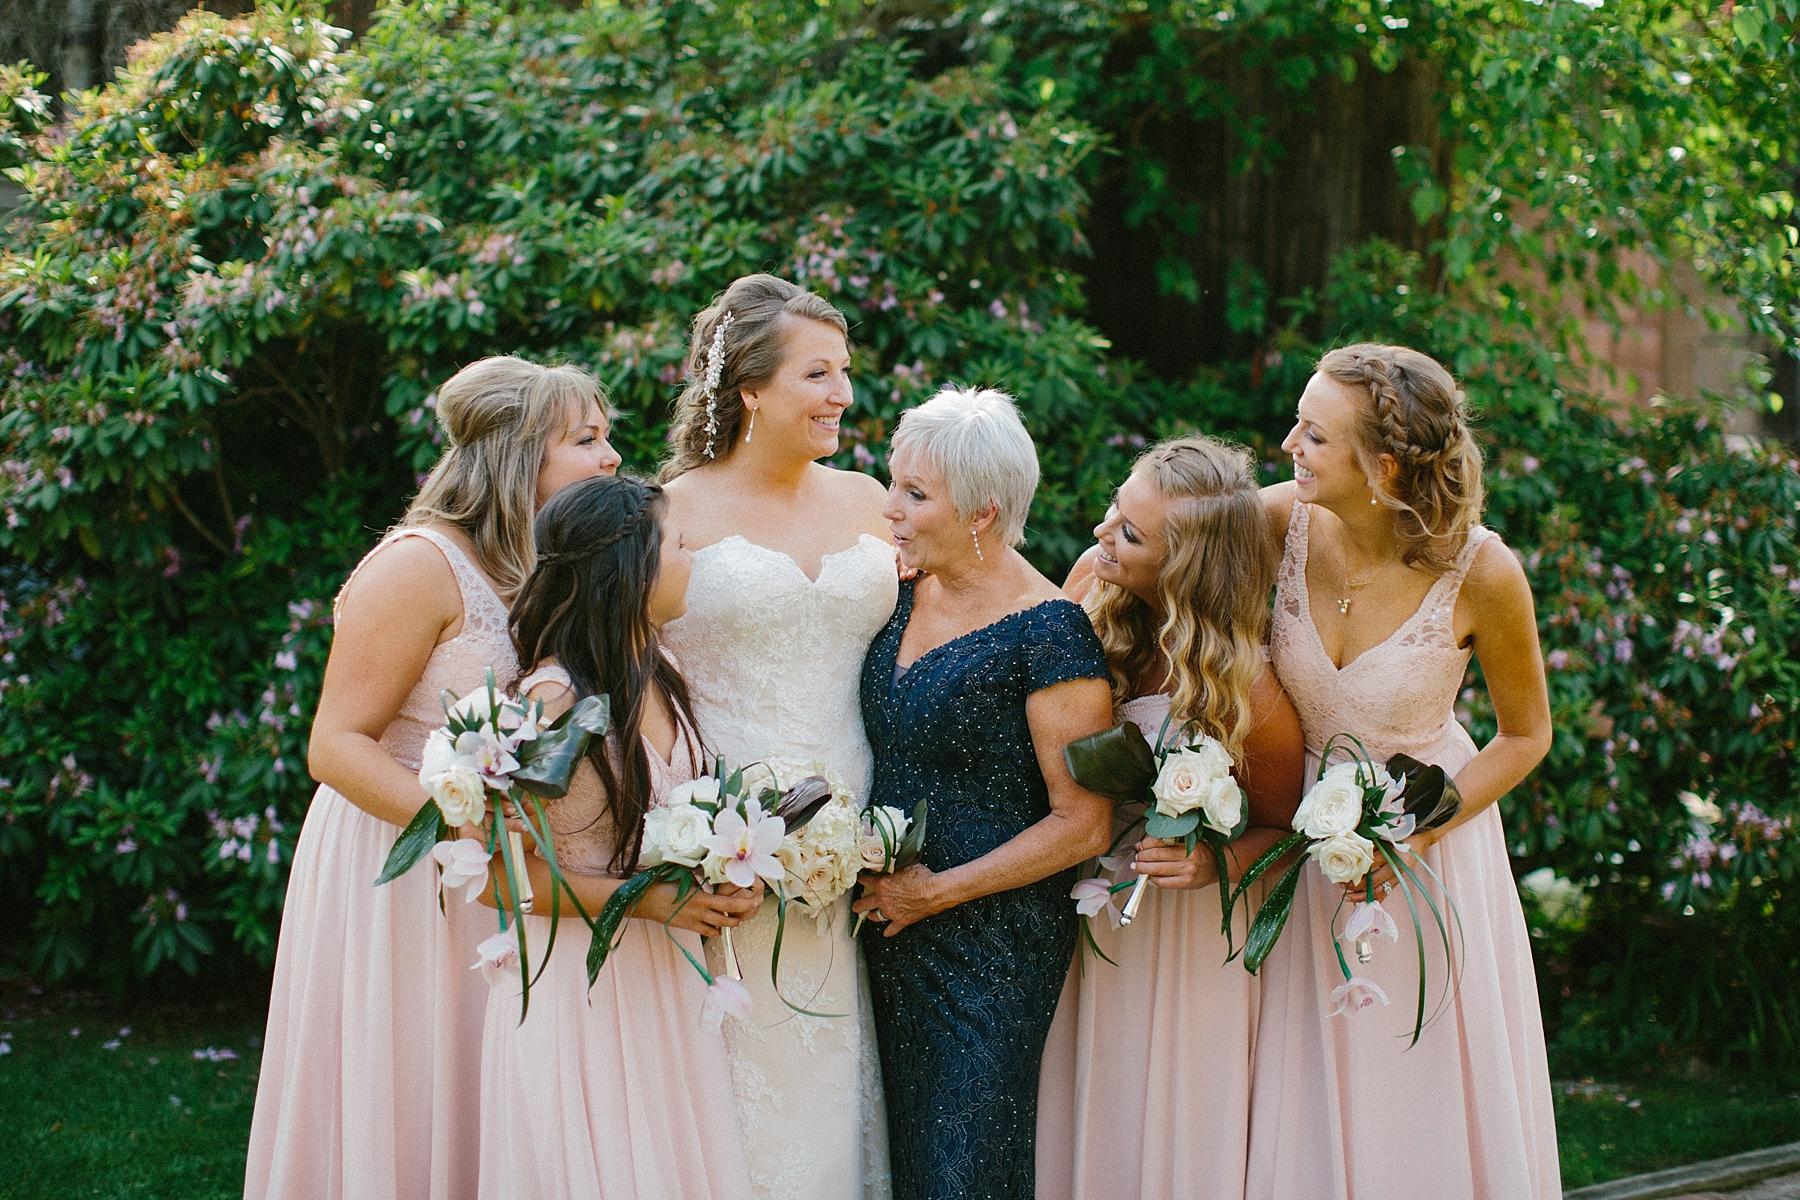 farm-wedding-engagement-session-destination-intimate_0030.jpg